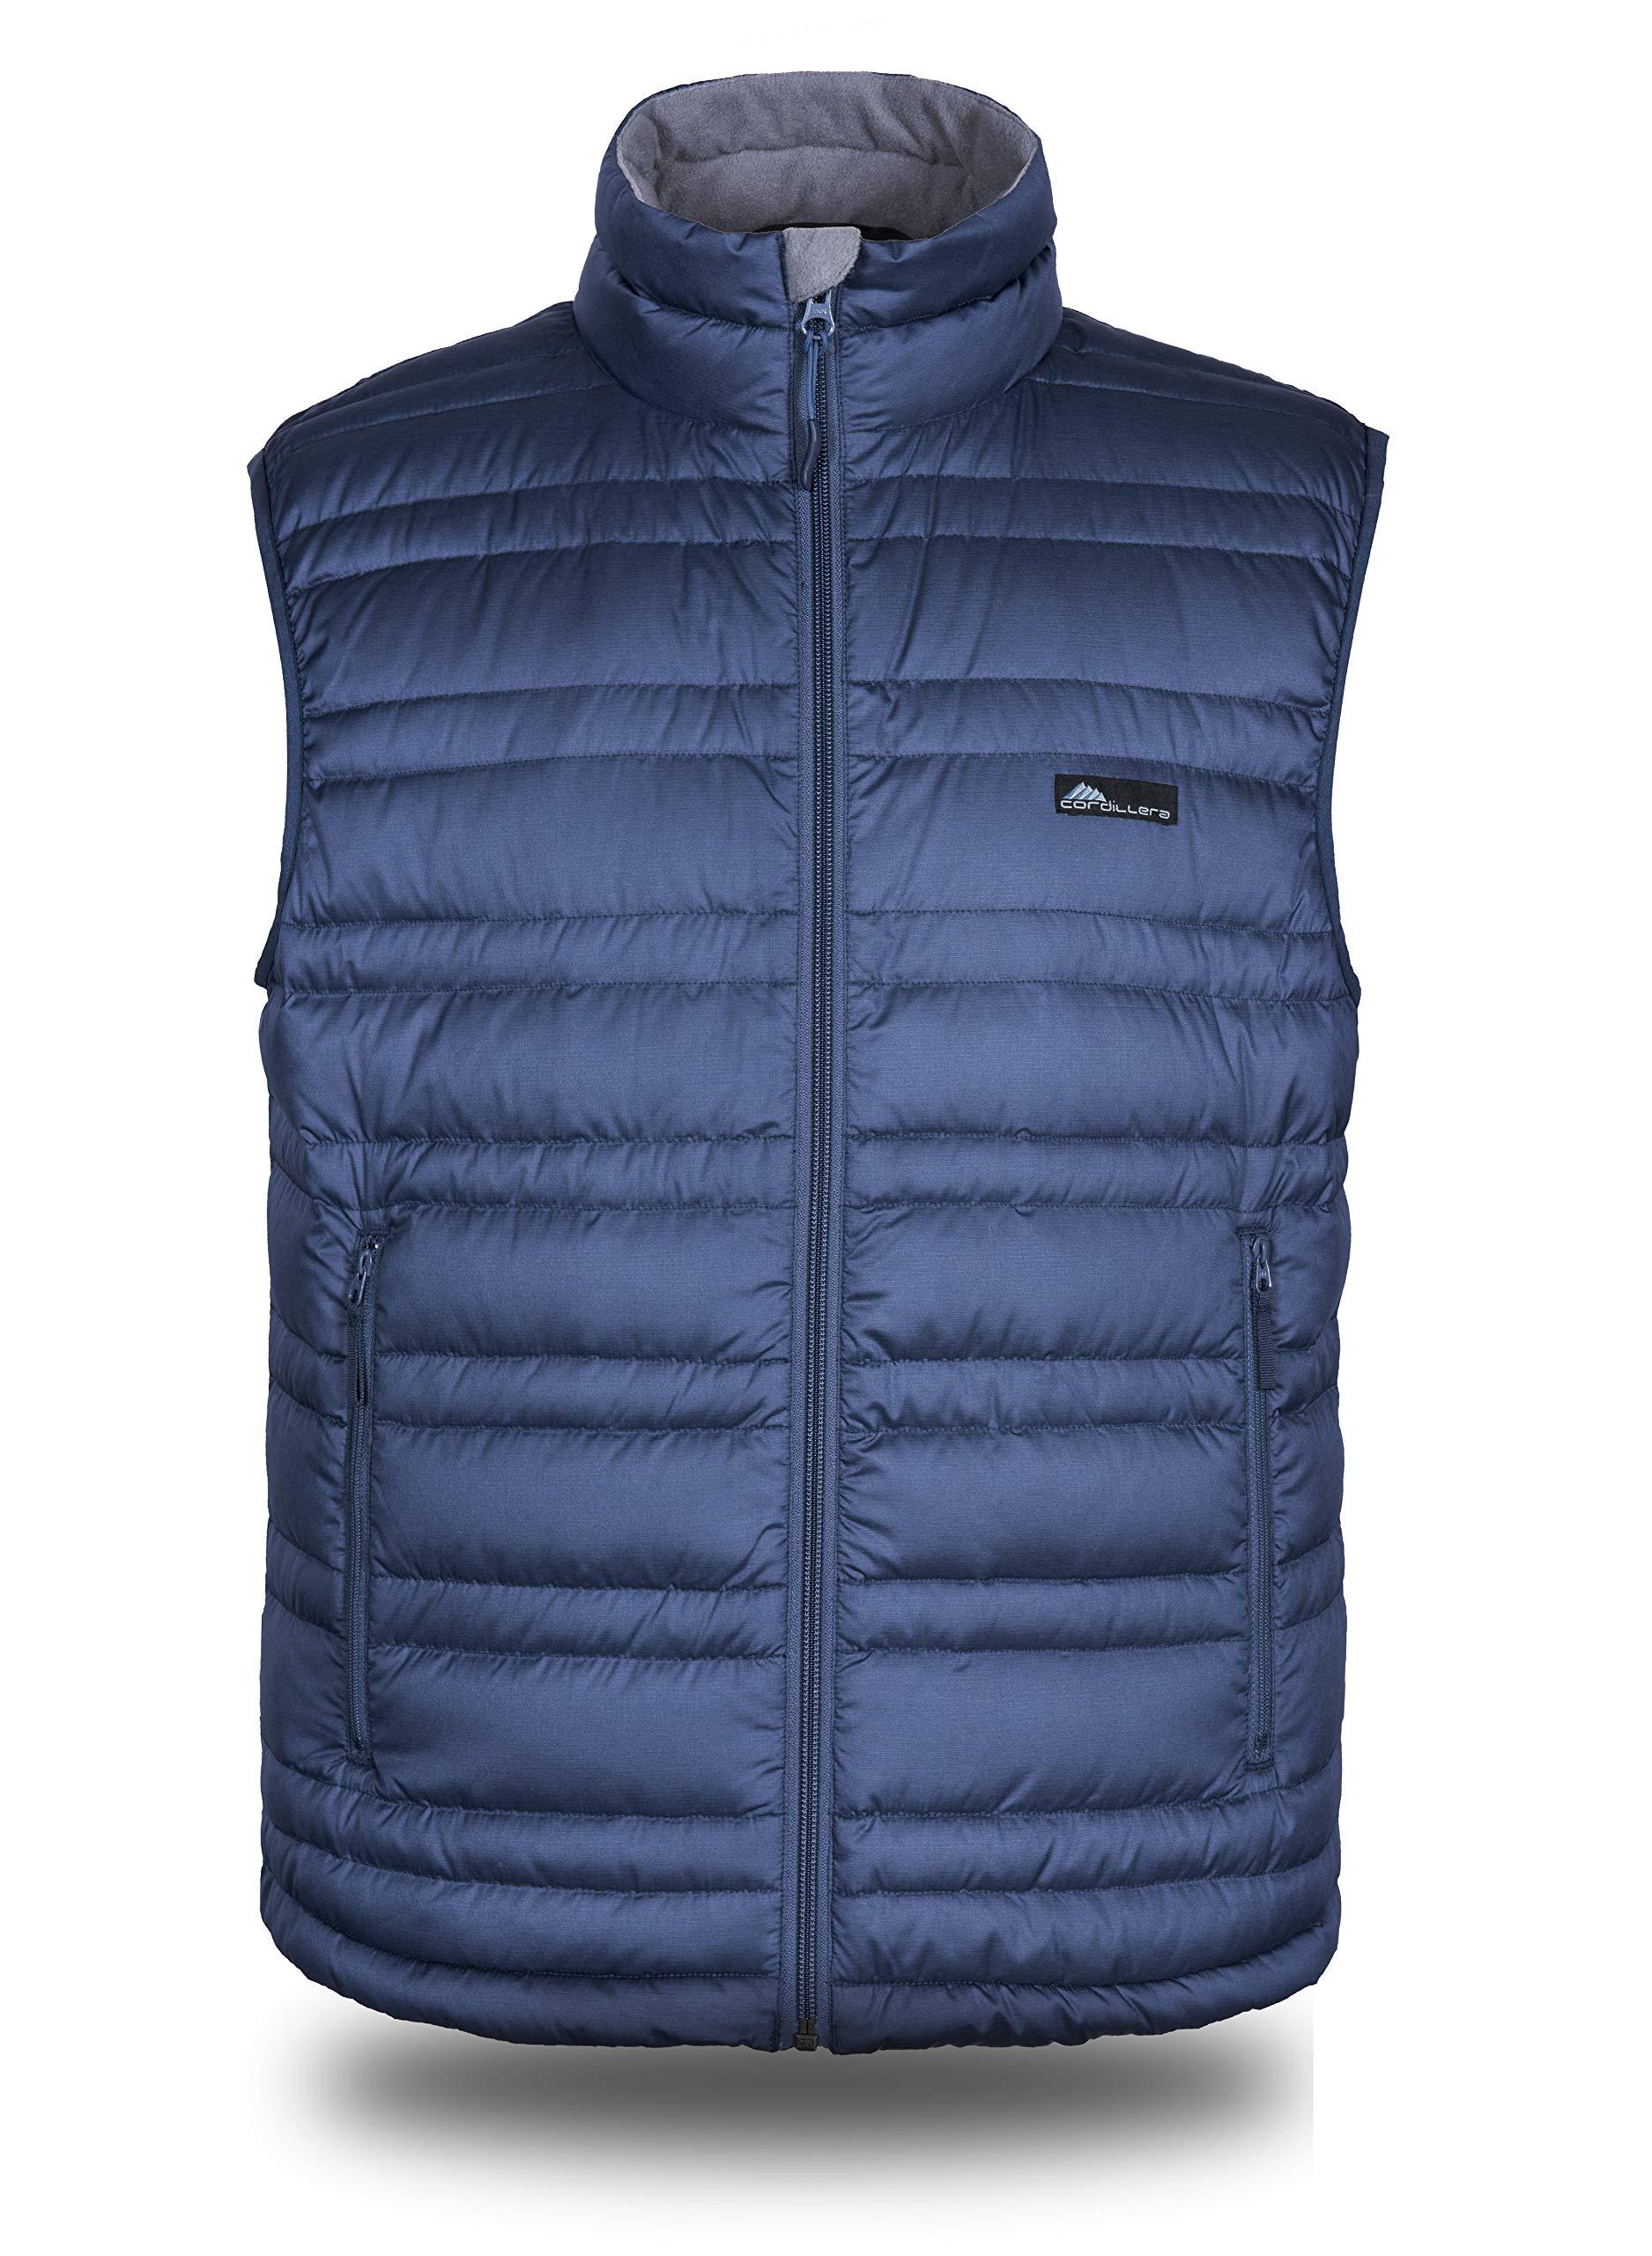 Cordillera Men's Lightweight Down Vest (Dress Blue, XXL) by Cordillera